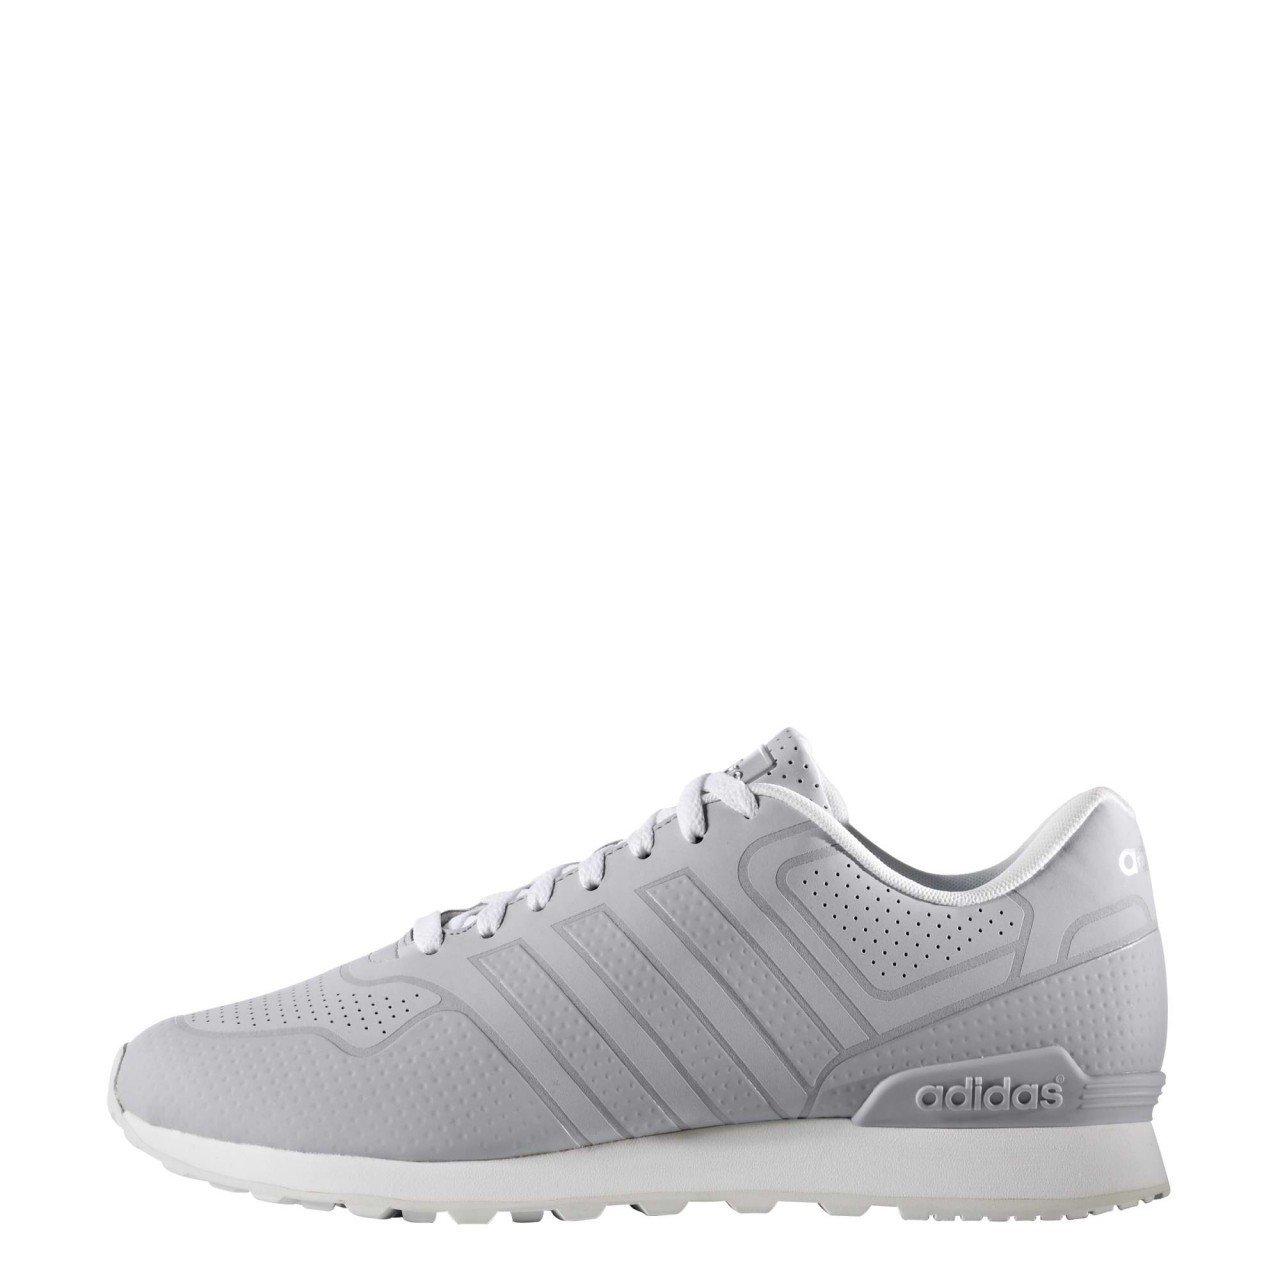 Adidas 10K CASUAL Lifestyle-Schuhe-Herren - clonix clonix msilve